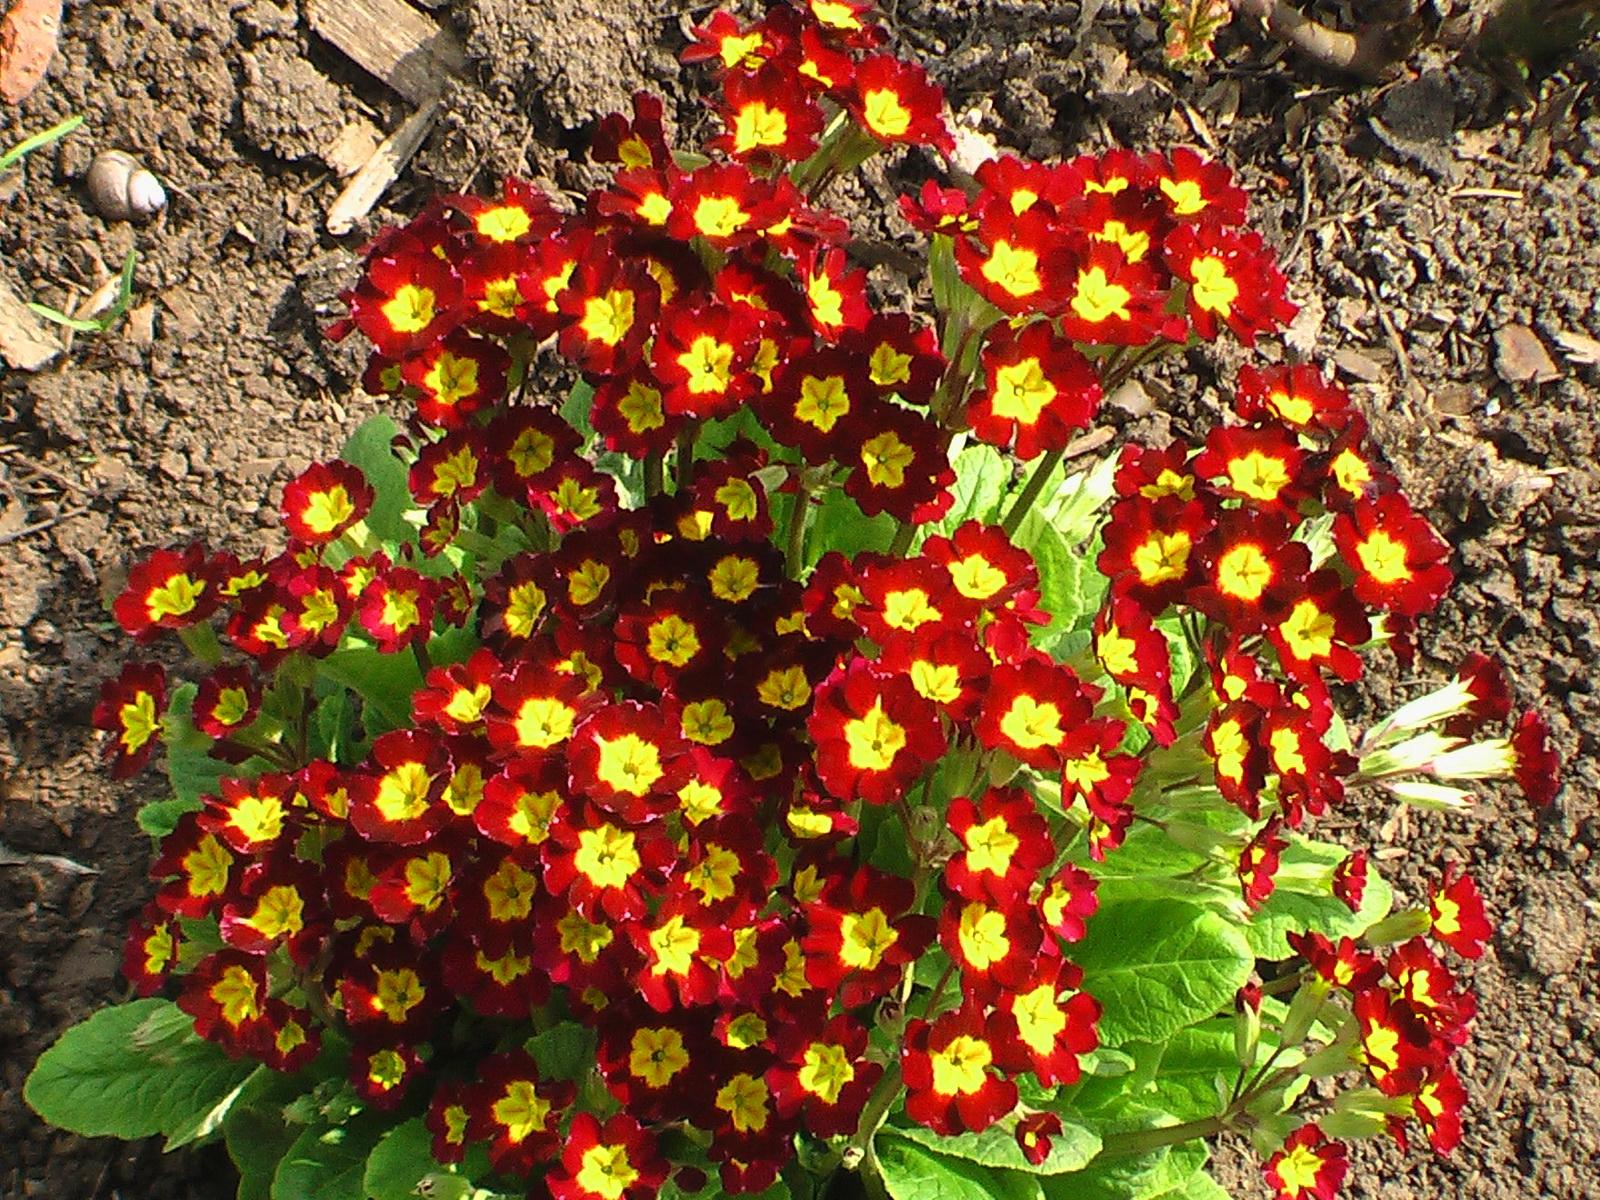 Комнатный цветок, цветущий круглый 15